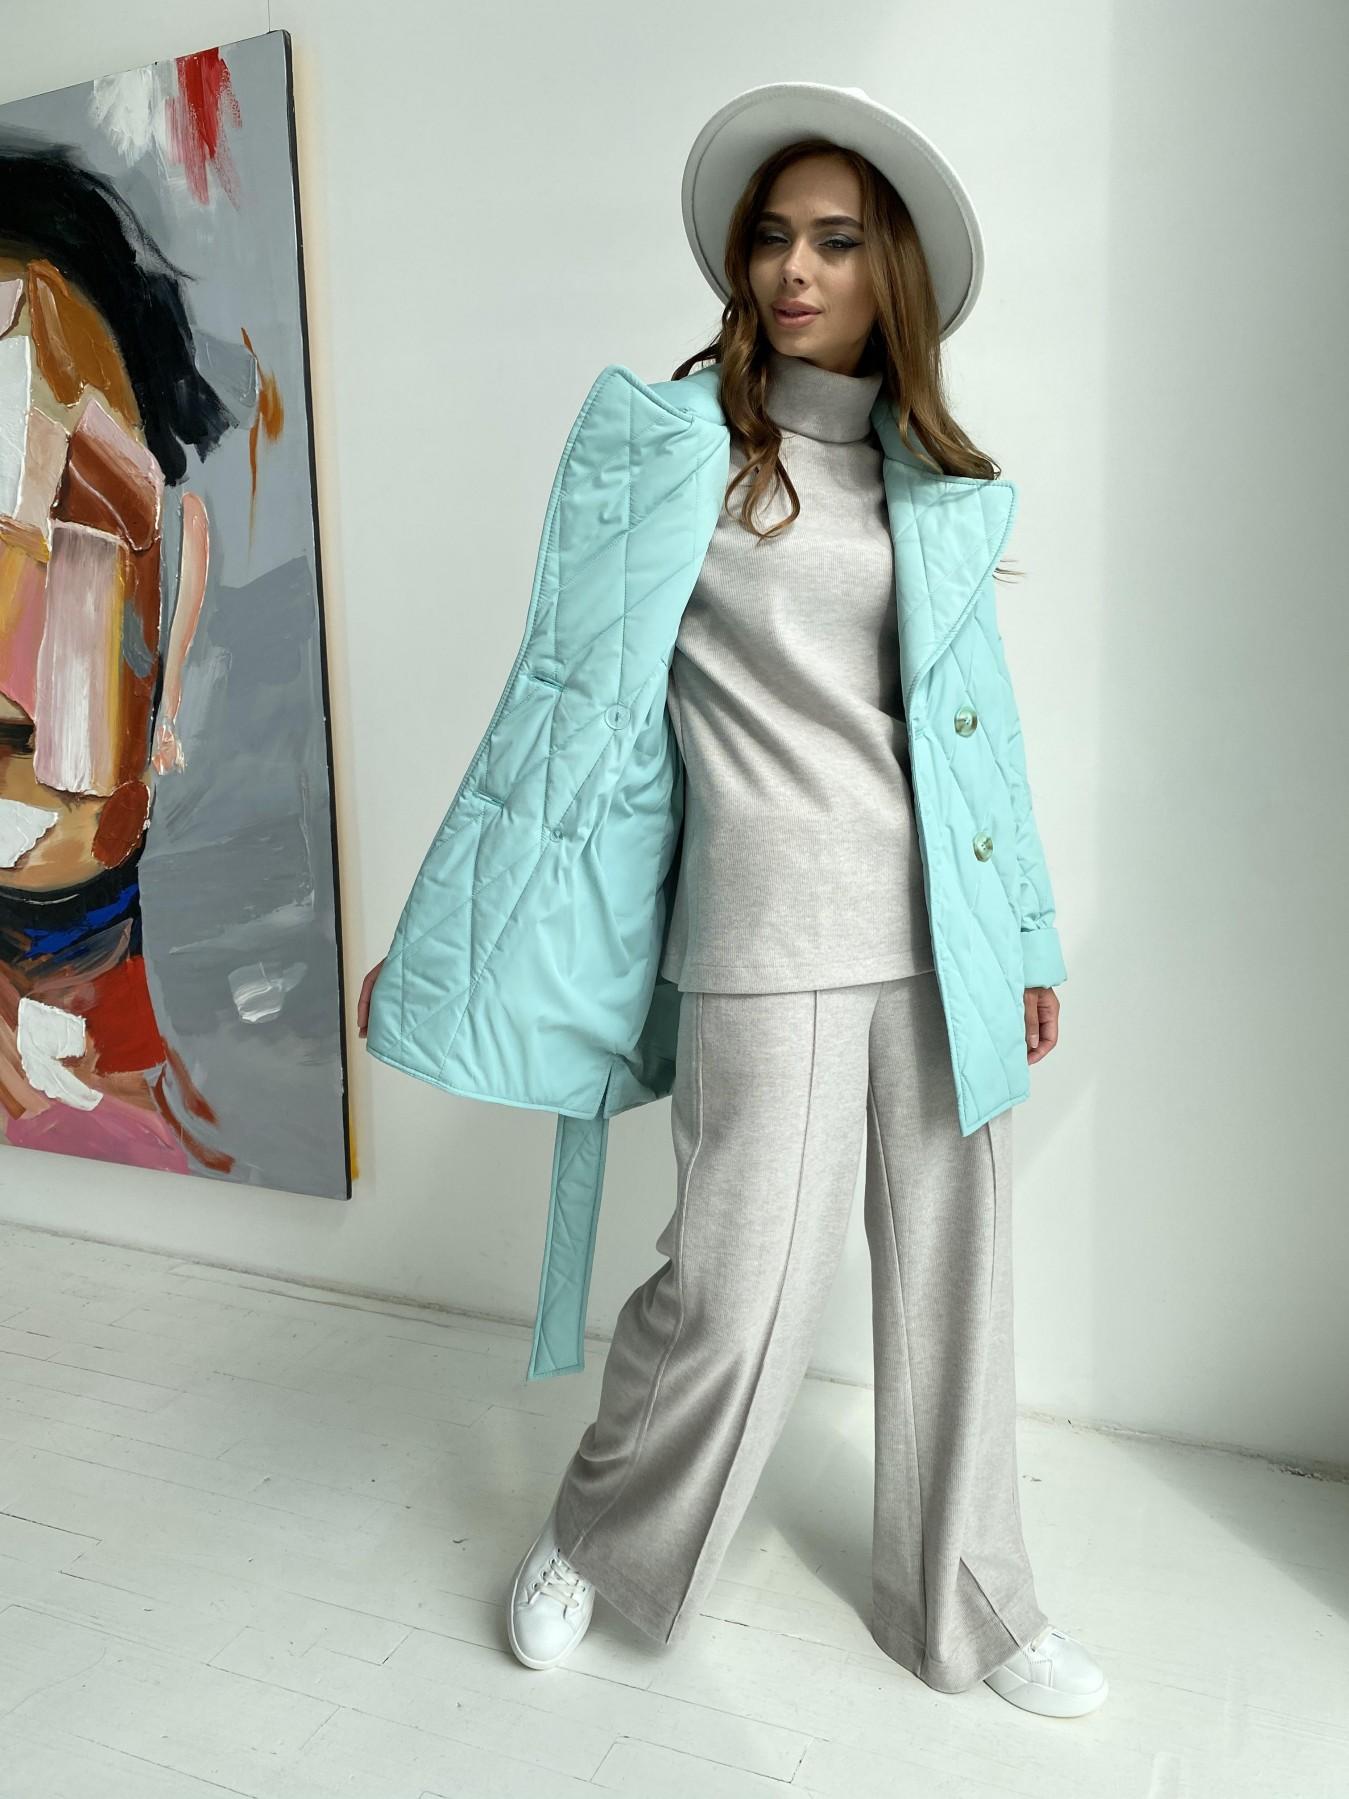 Норд стеганая куртка из плащеки 11770  АРТ. 48511 Цвет: Олива 2 - фото 5, интернет магазин tm-modus.ru